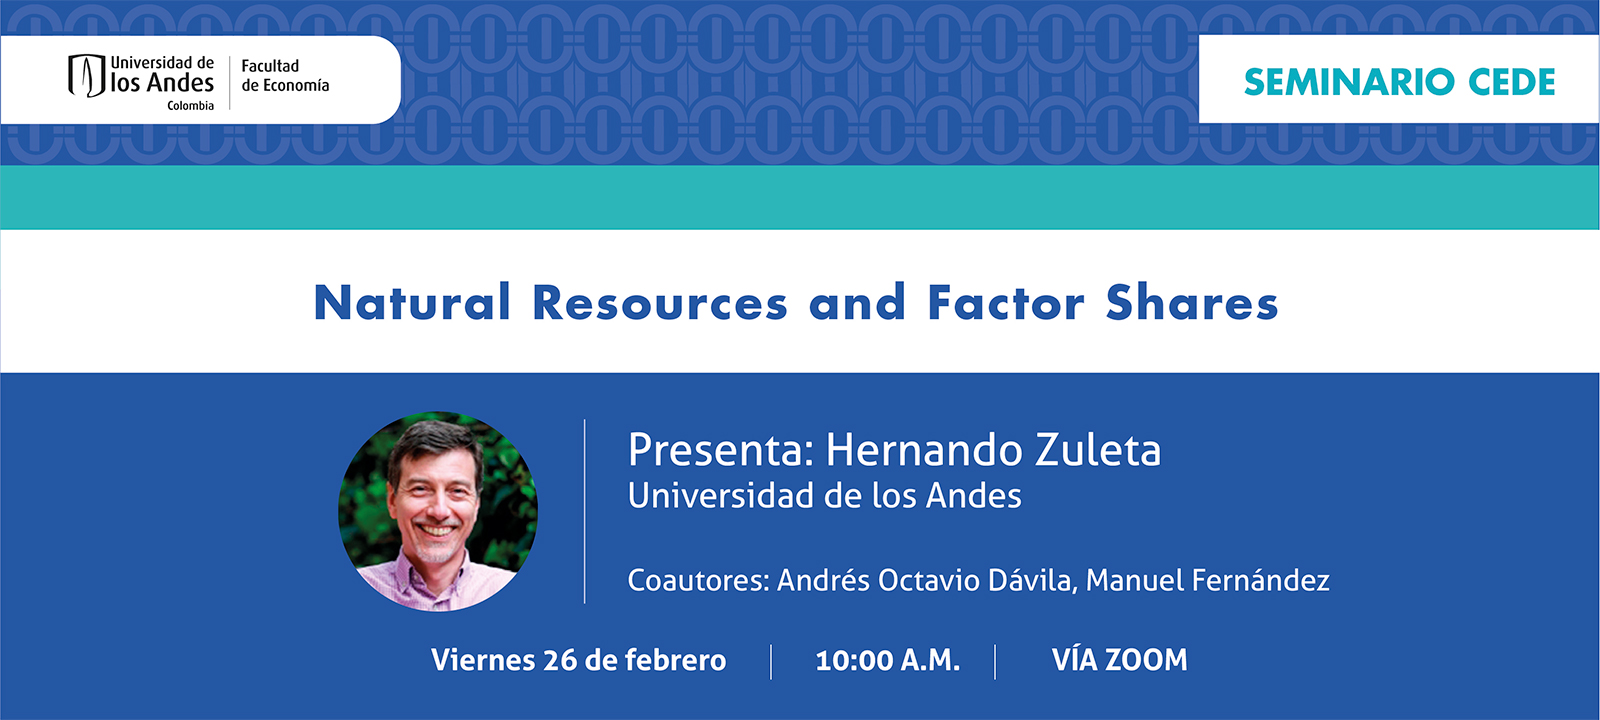 SeminarioCEDE-2021-02-26-Hernando-Zuleta.jpg